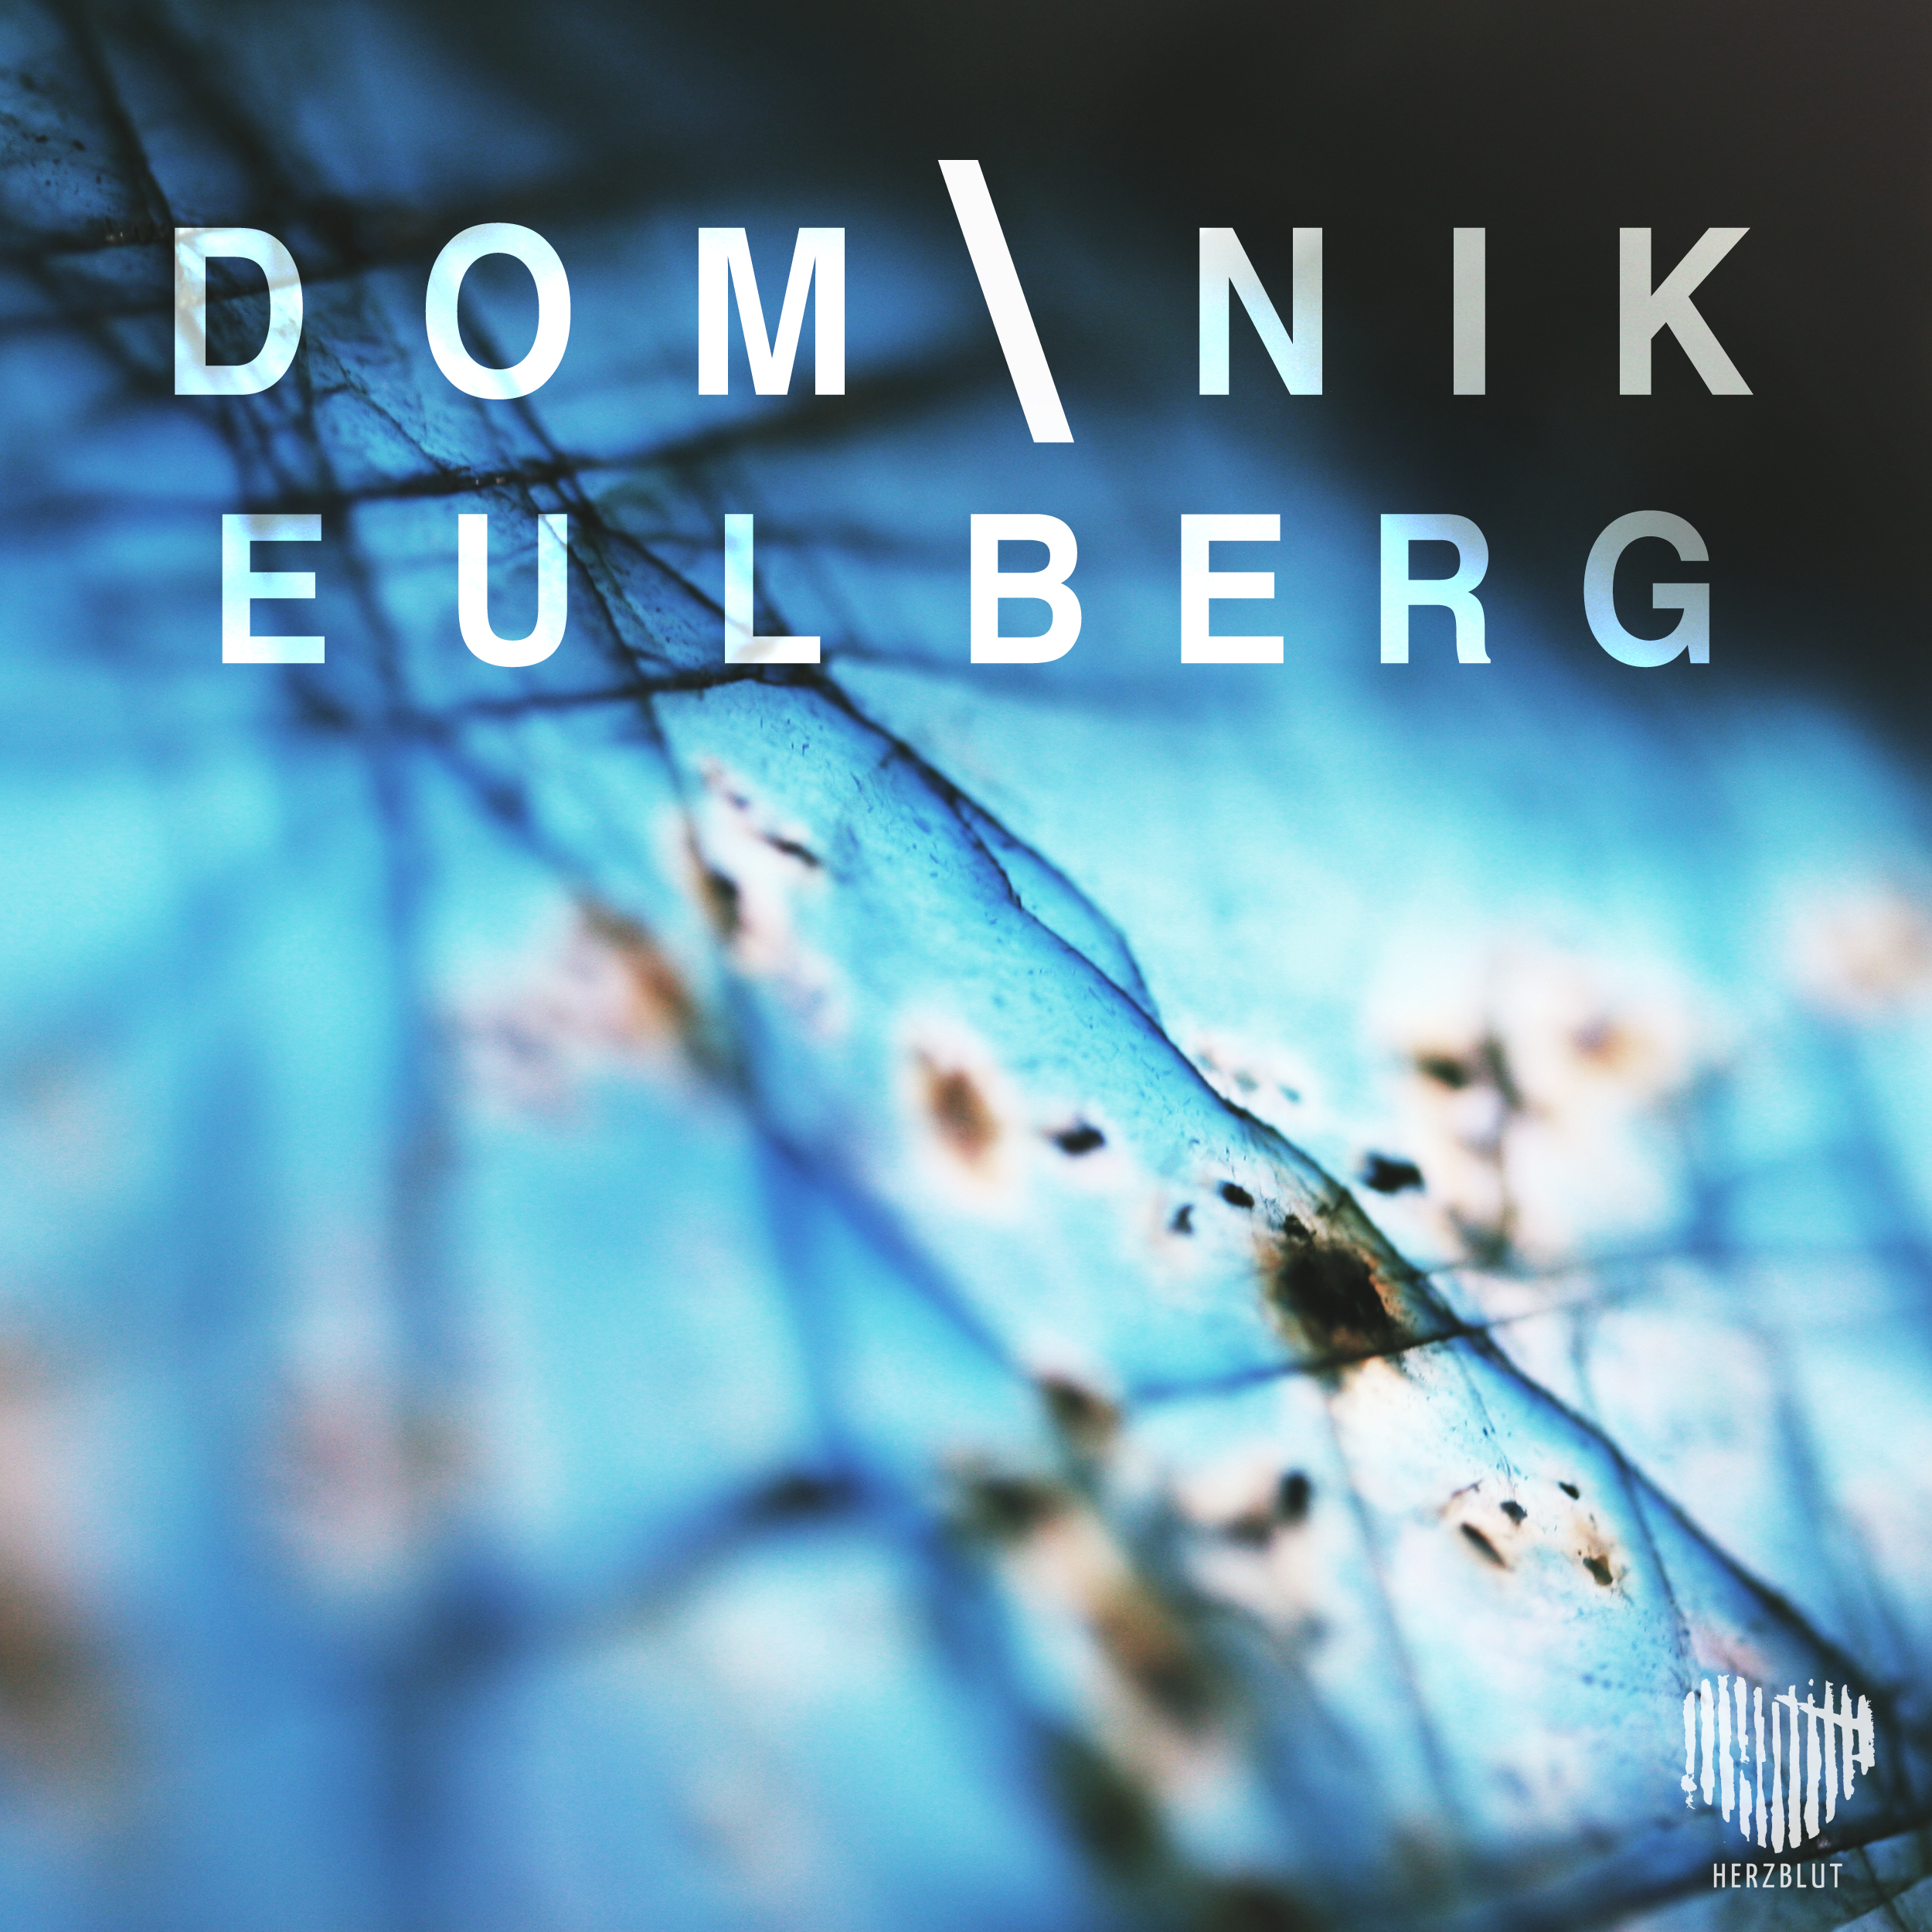 Dominik Eulberg mit Herzblut!